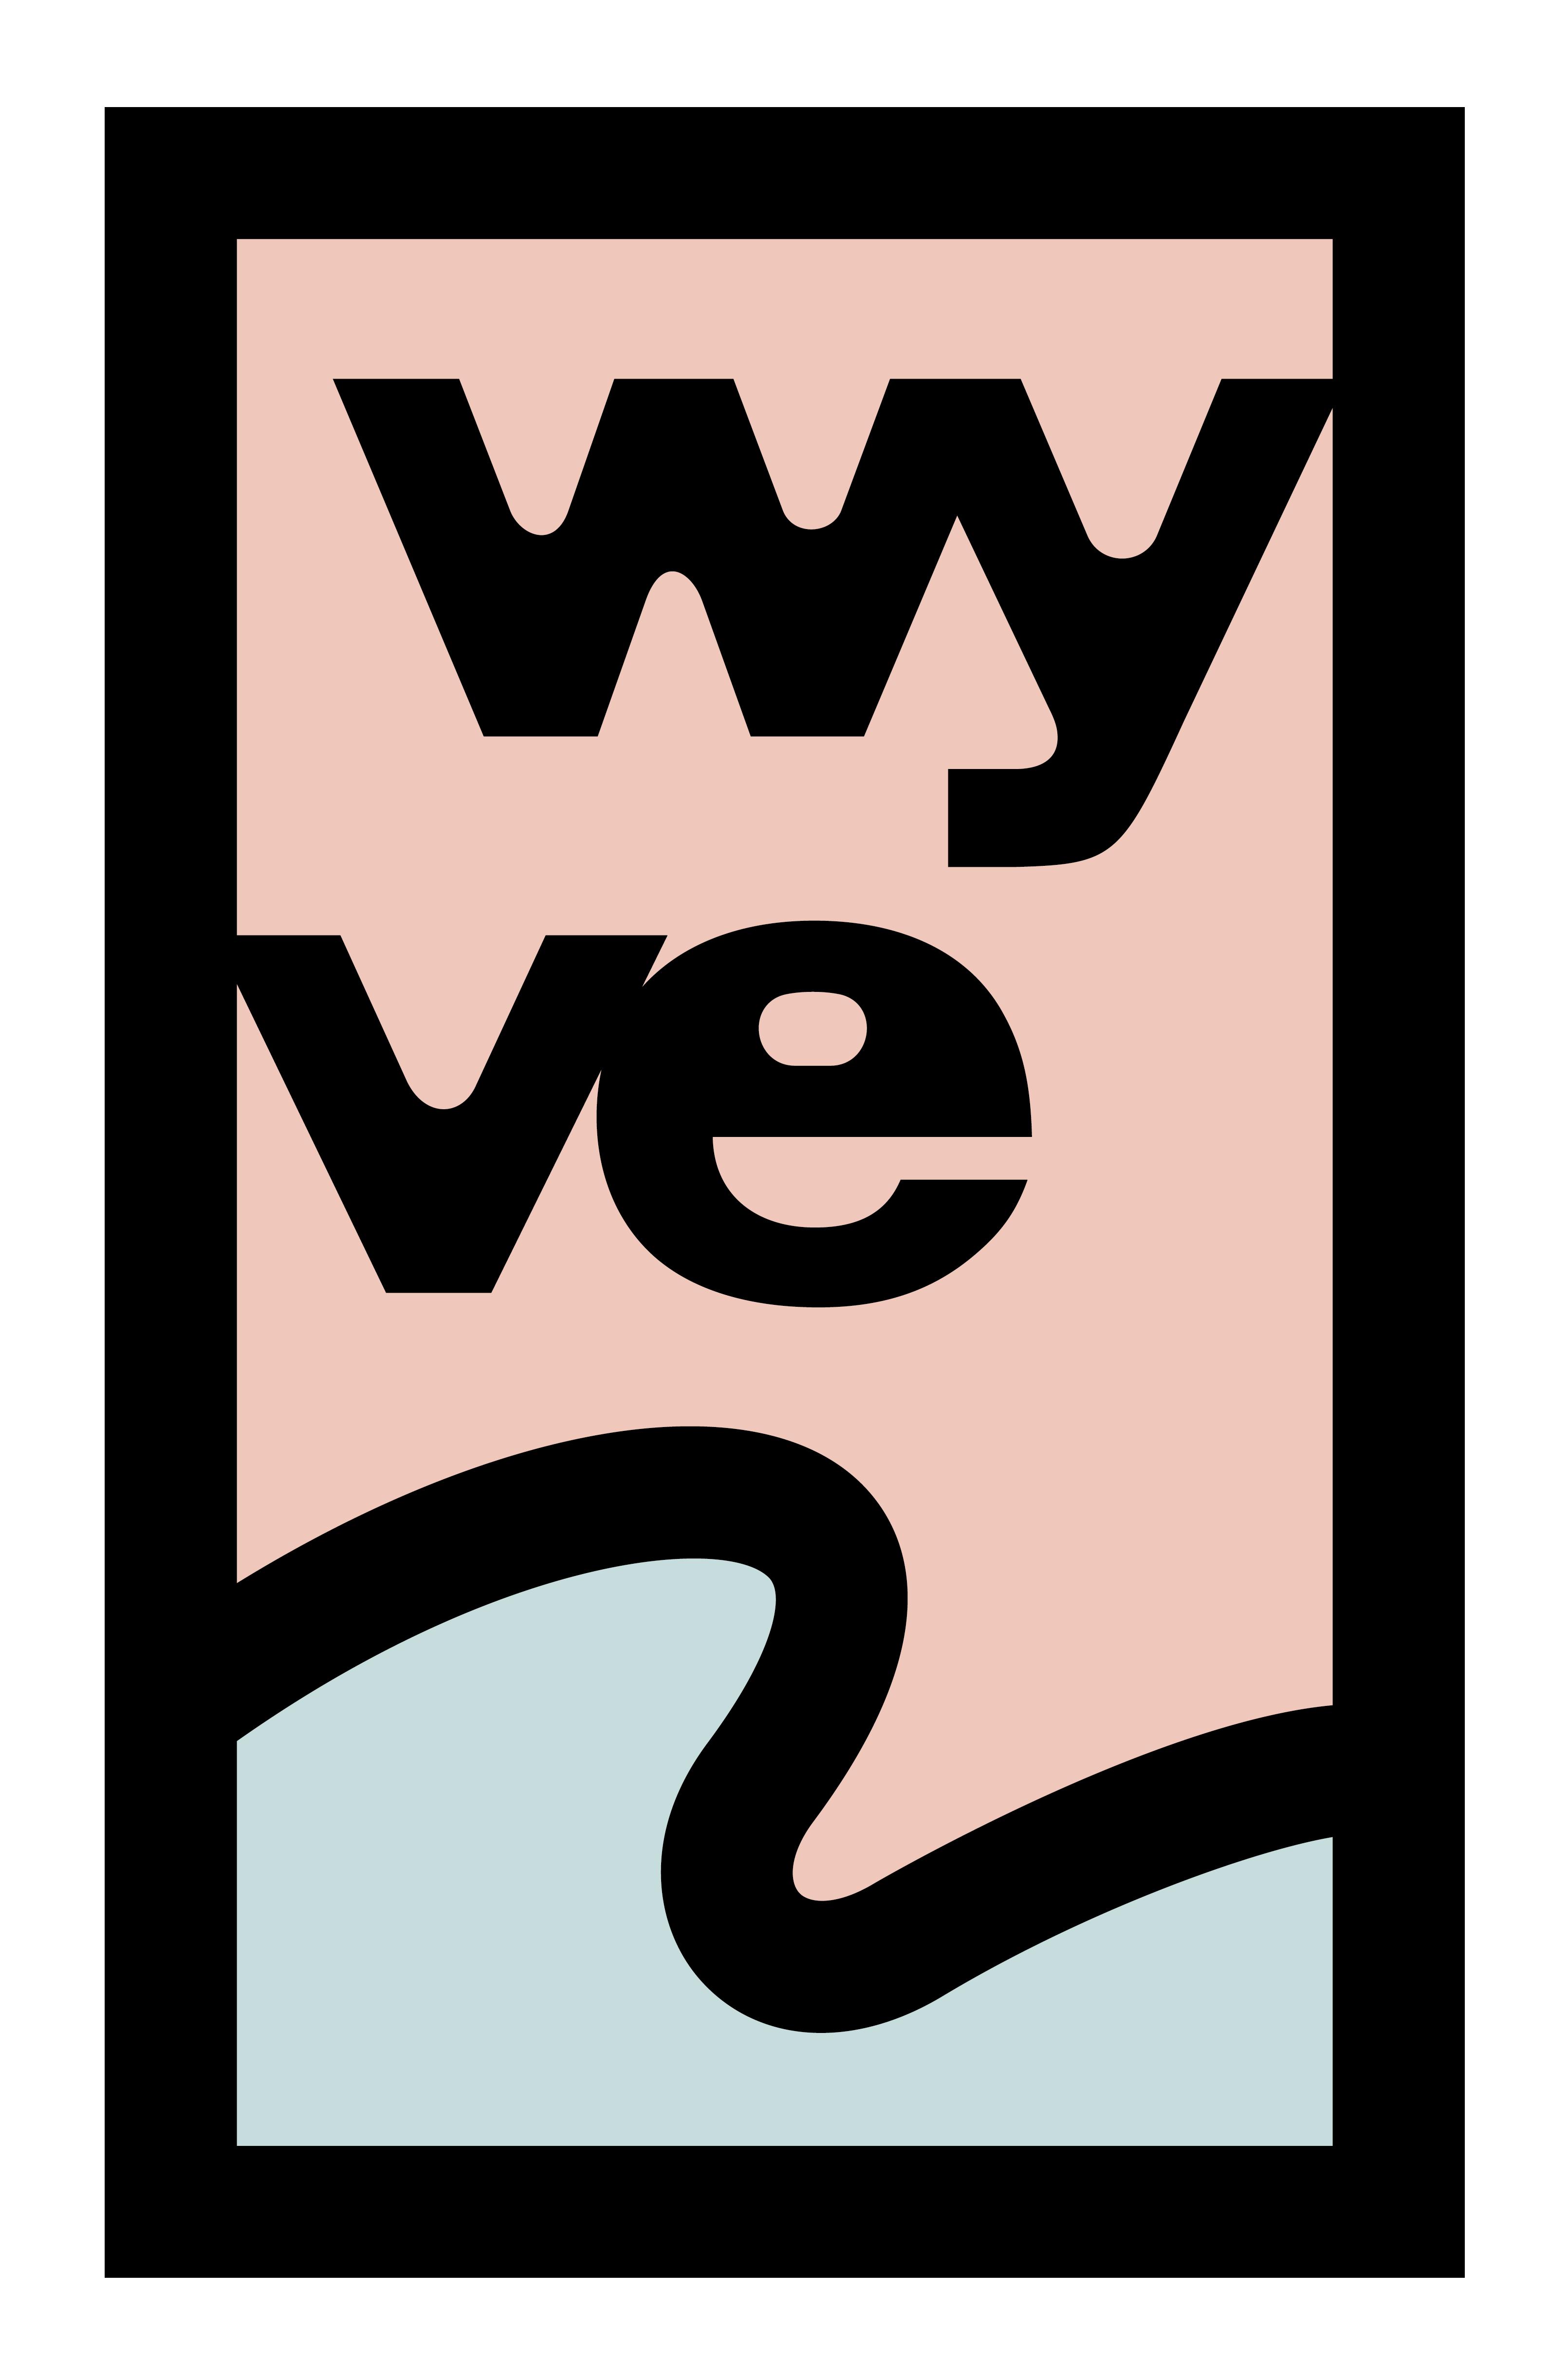 logo wyve primary colored